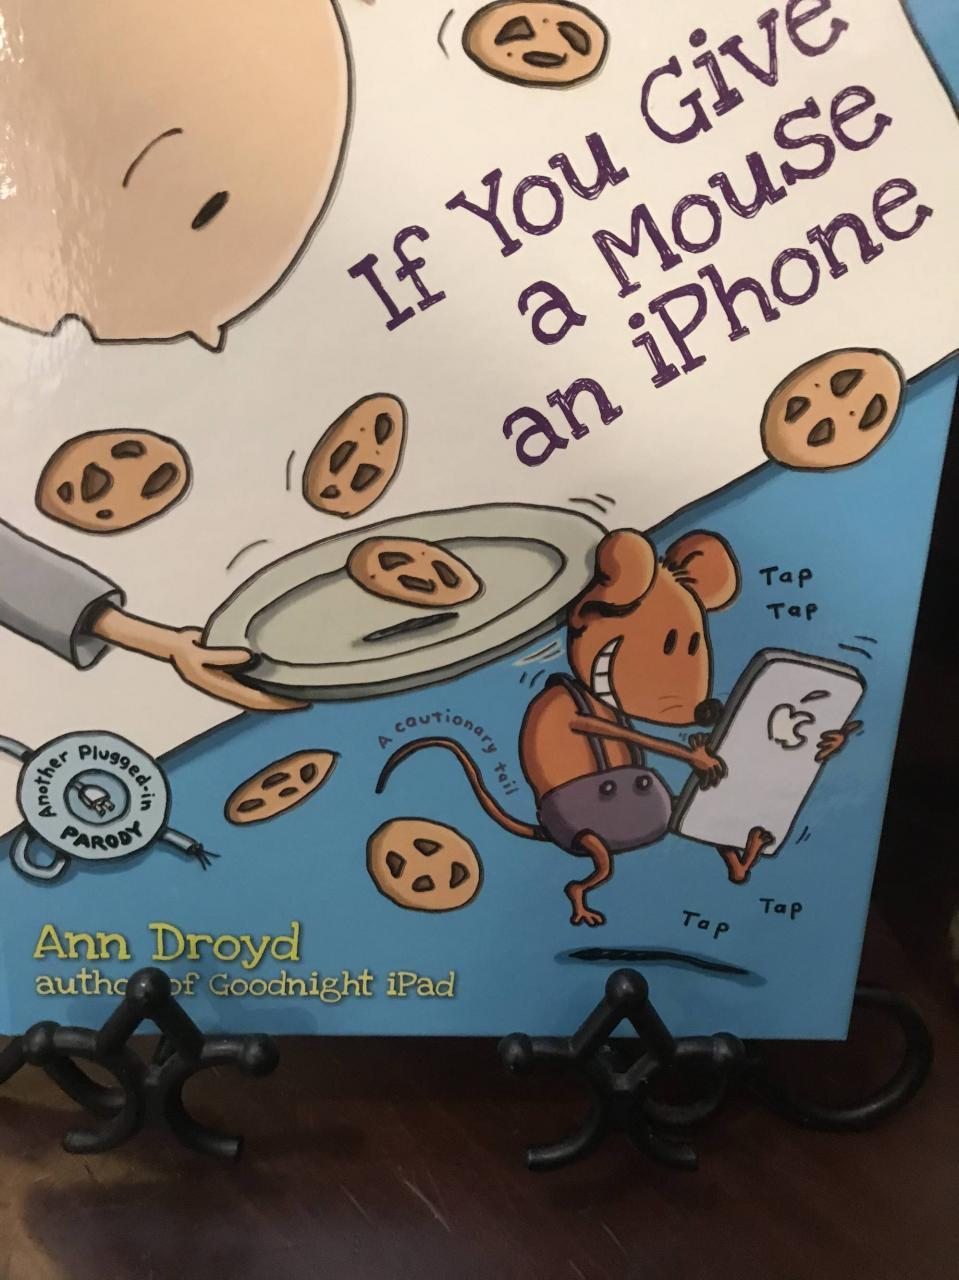 Phone bad cookie good